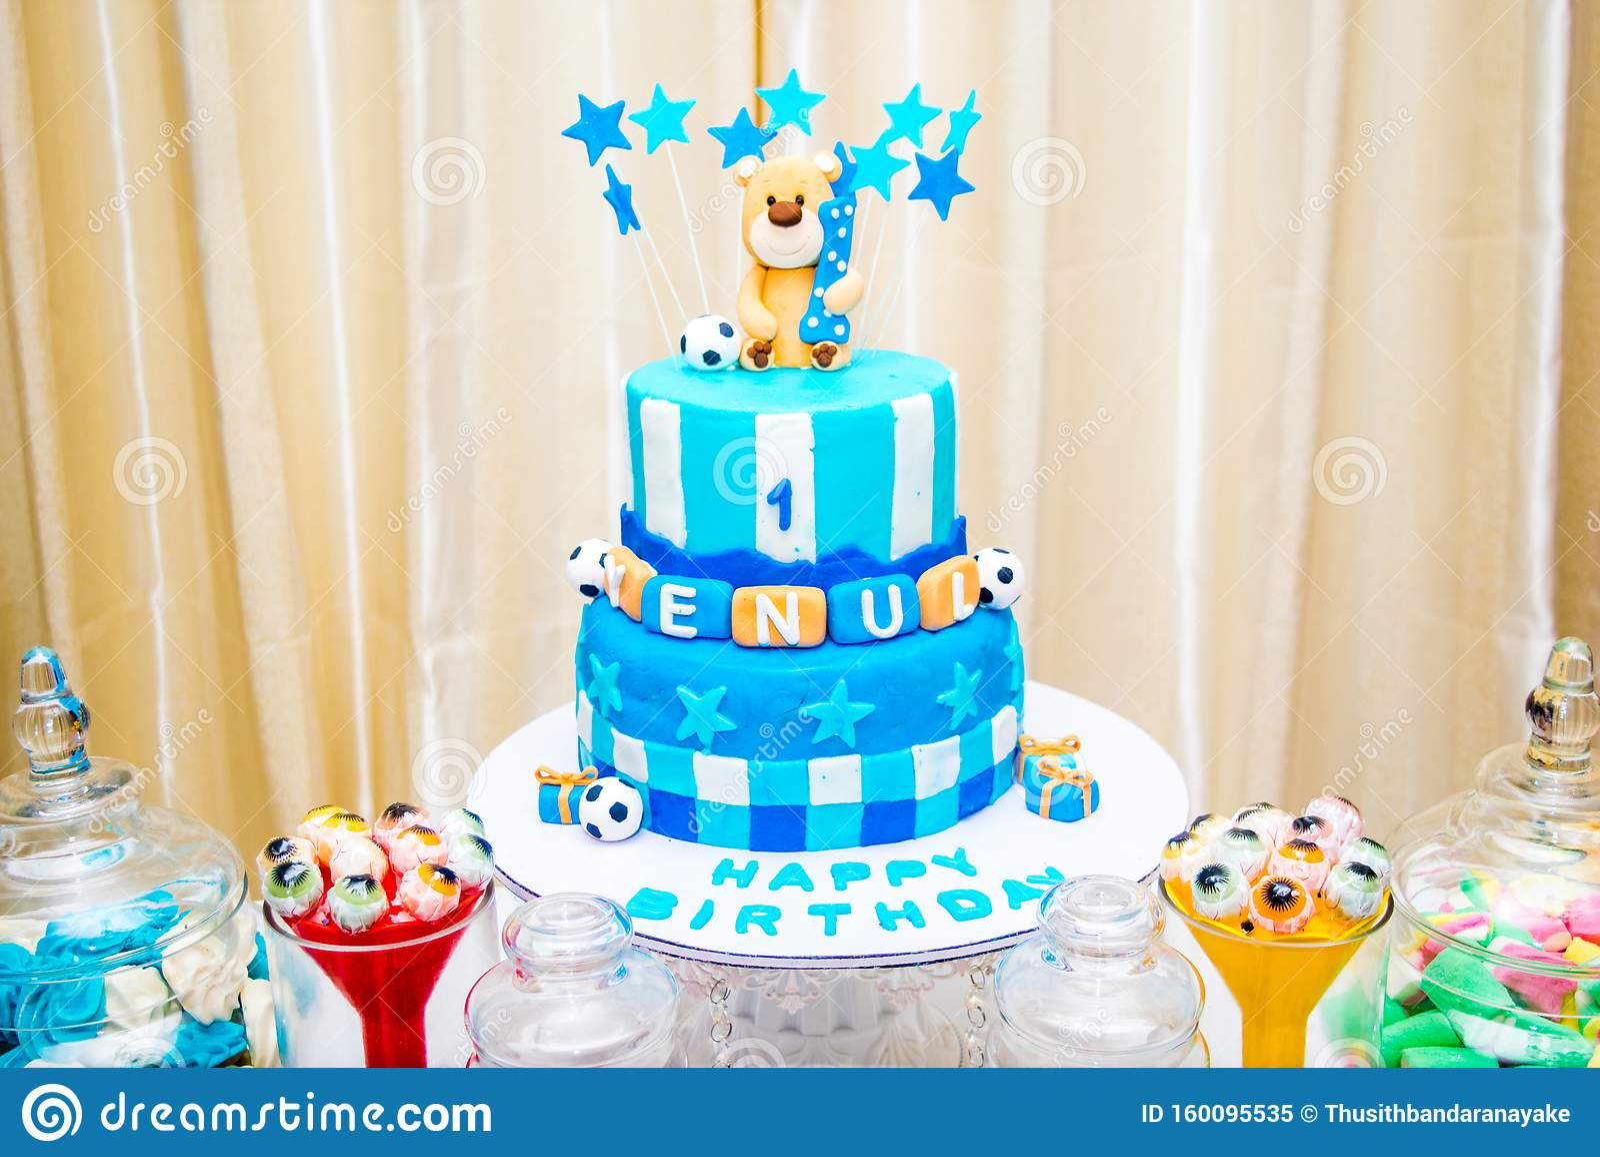 Happy Birthday Cake With Blue Theme Stock Image Image Of Designthis Boyunique 160095535